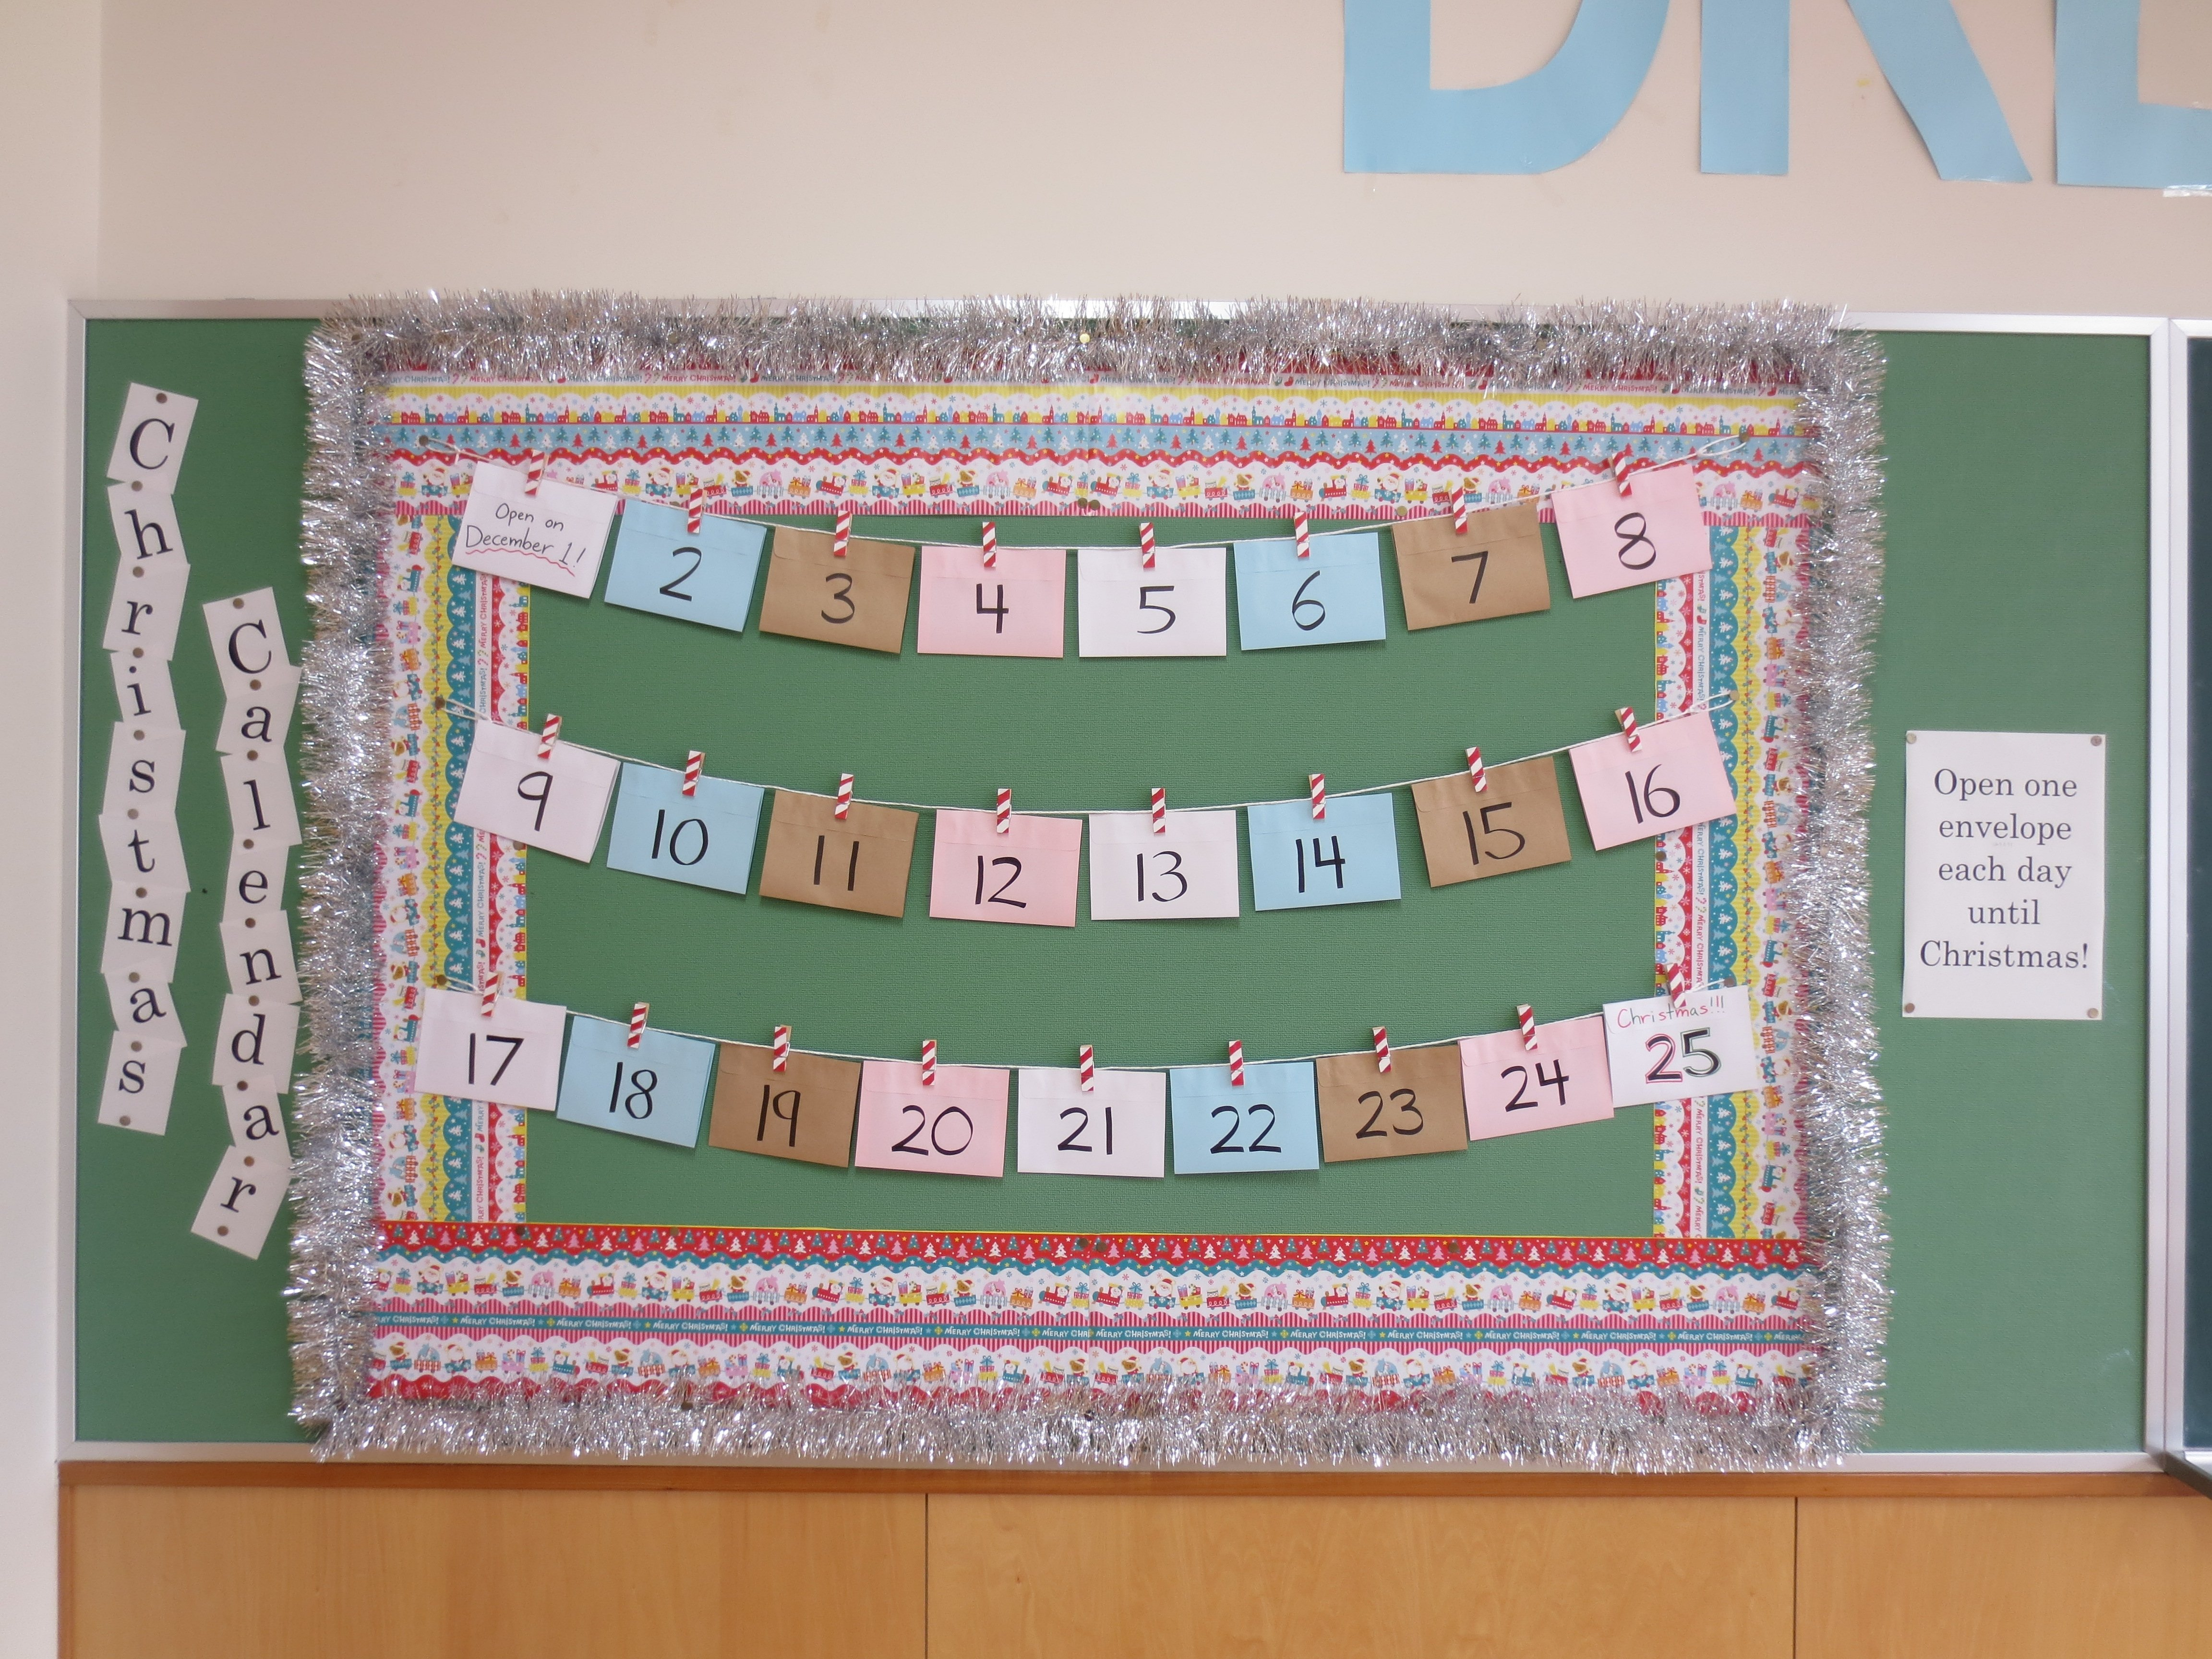 10 Lovable Bulletin Board Ideas Middle School simple english bulletin board ideas e7b4a0e695b5e381aae383a9e382a4e38395 4